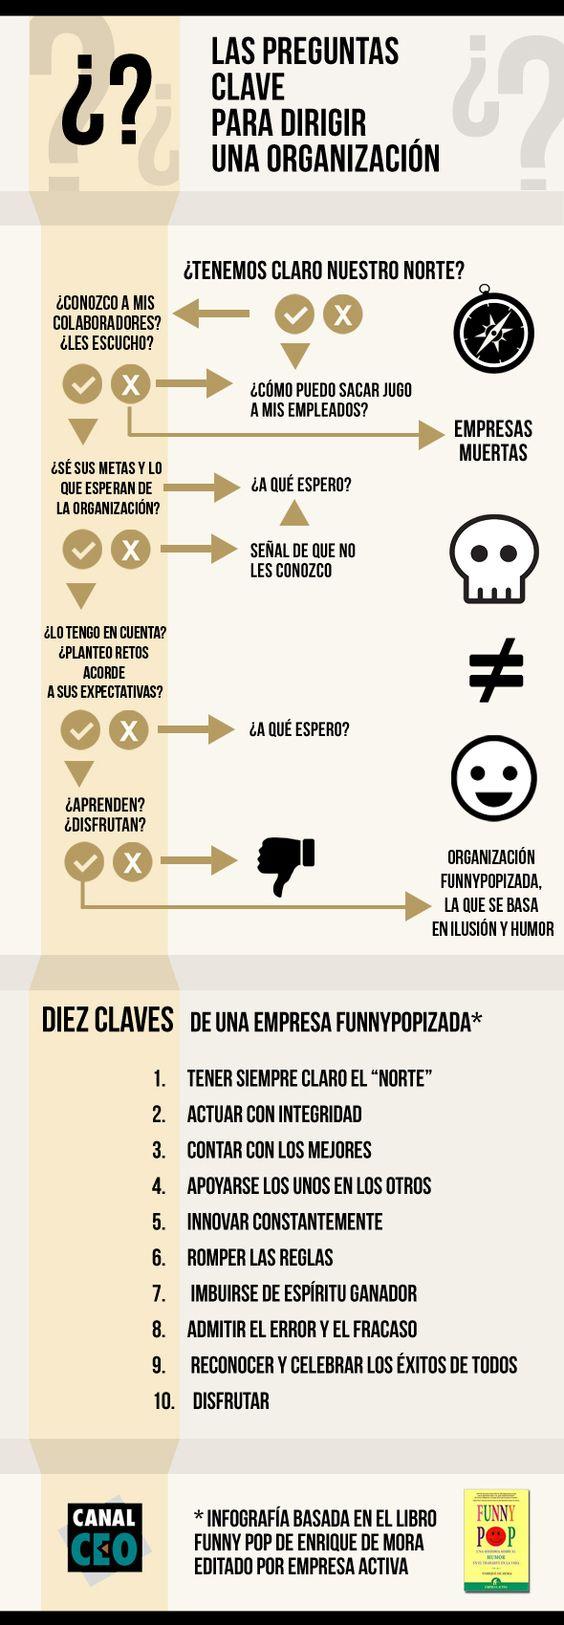 Claves empresa funnypopizada